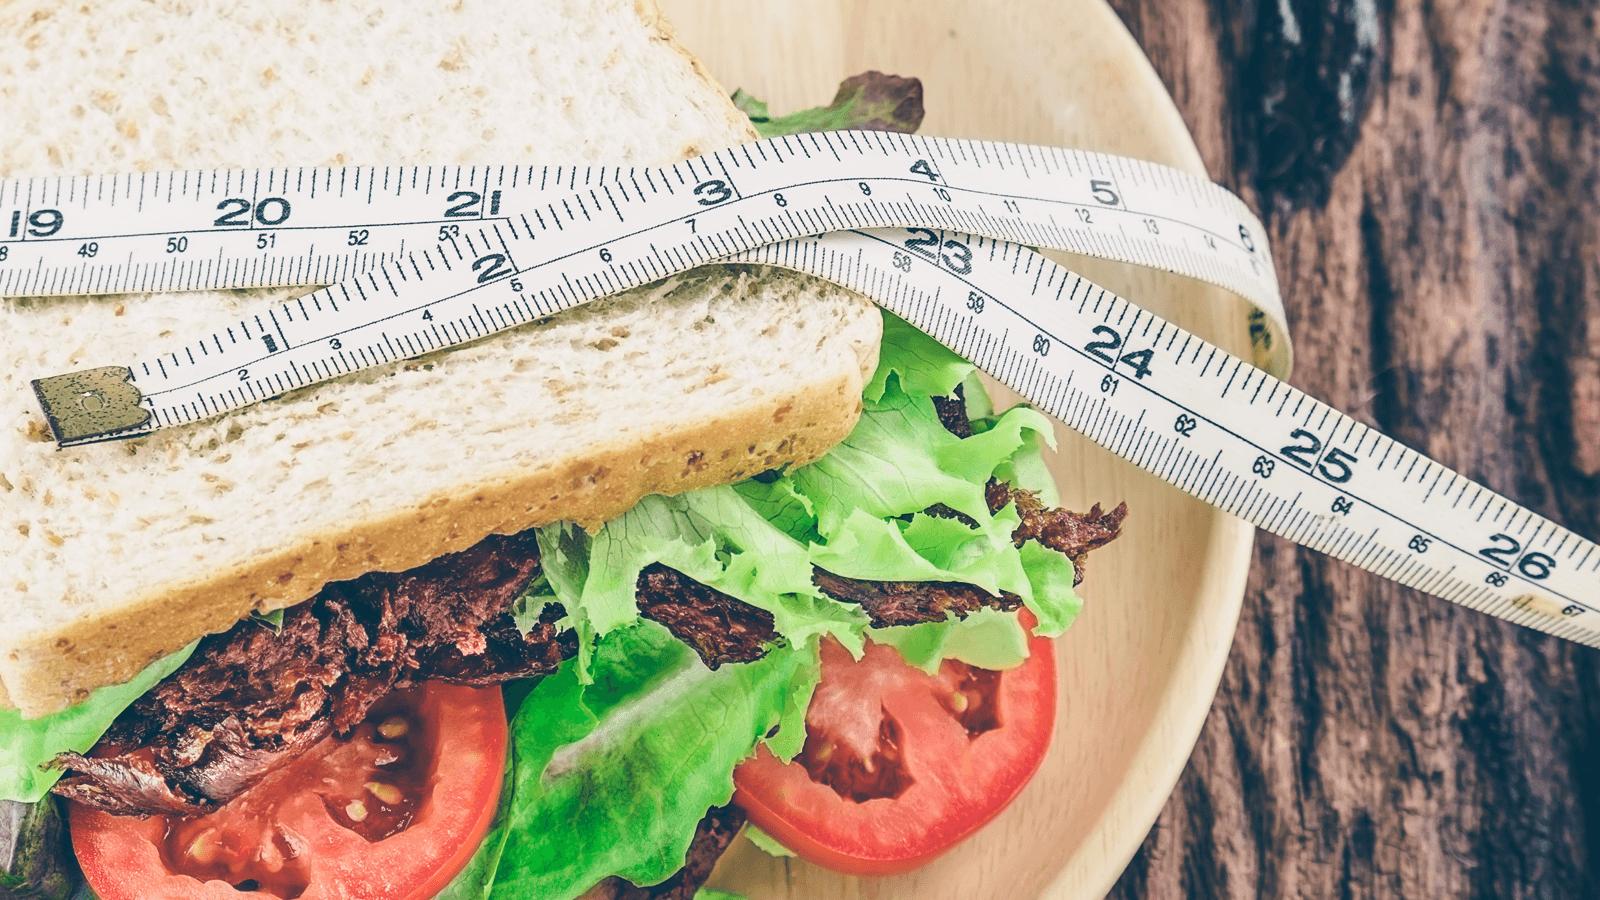 Giải đáp: Tiêu hao bao nhiêu calo để giảm 1kg?